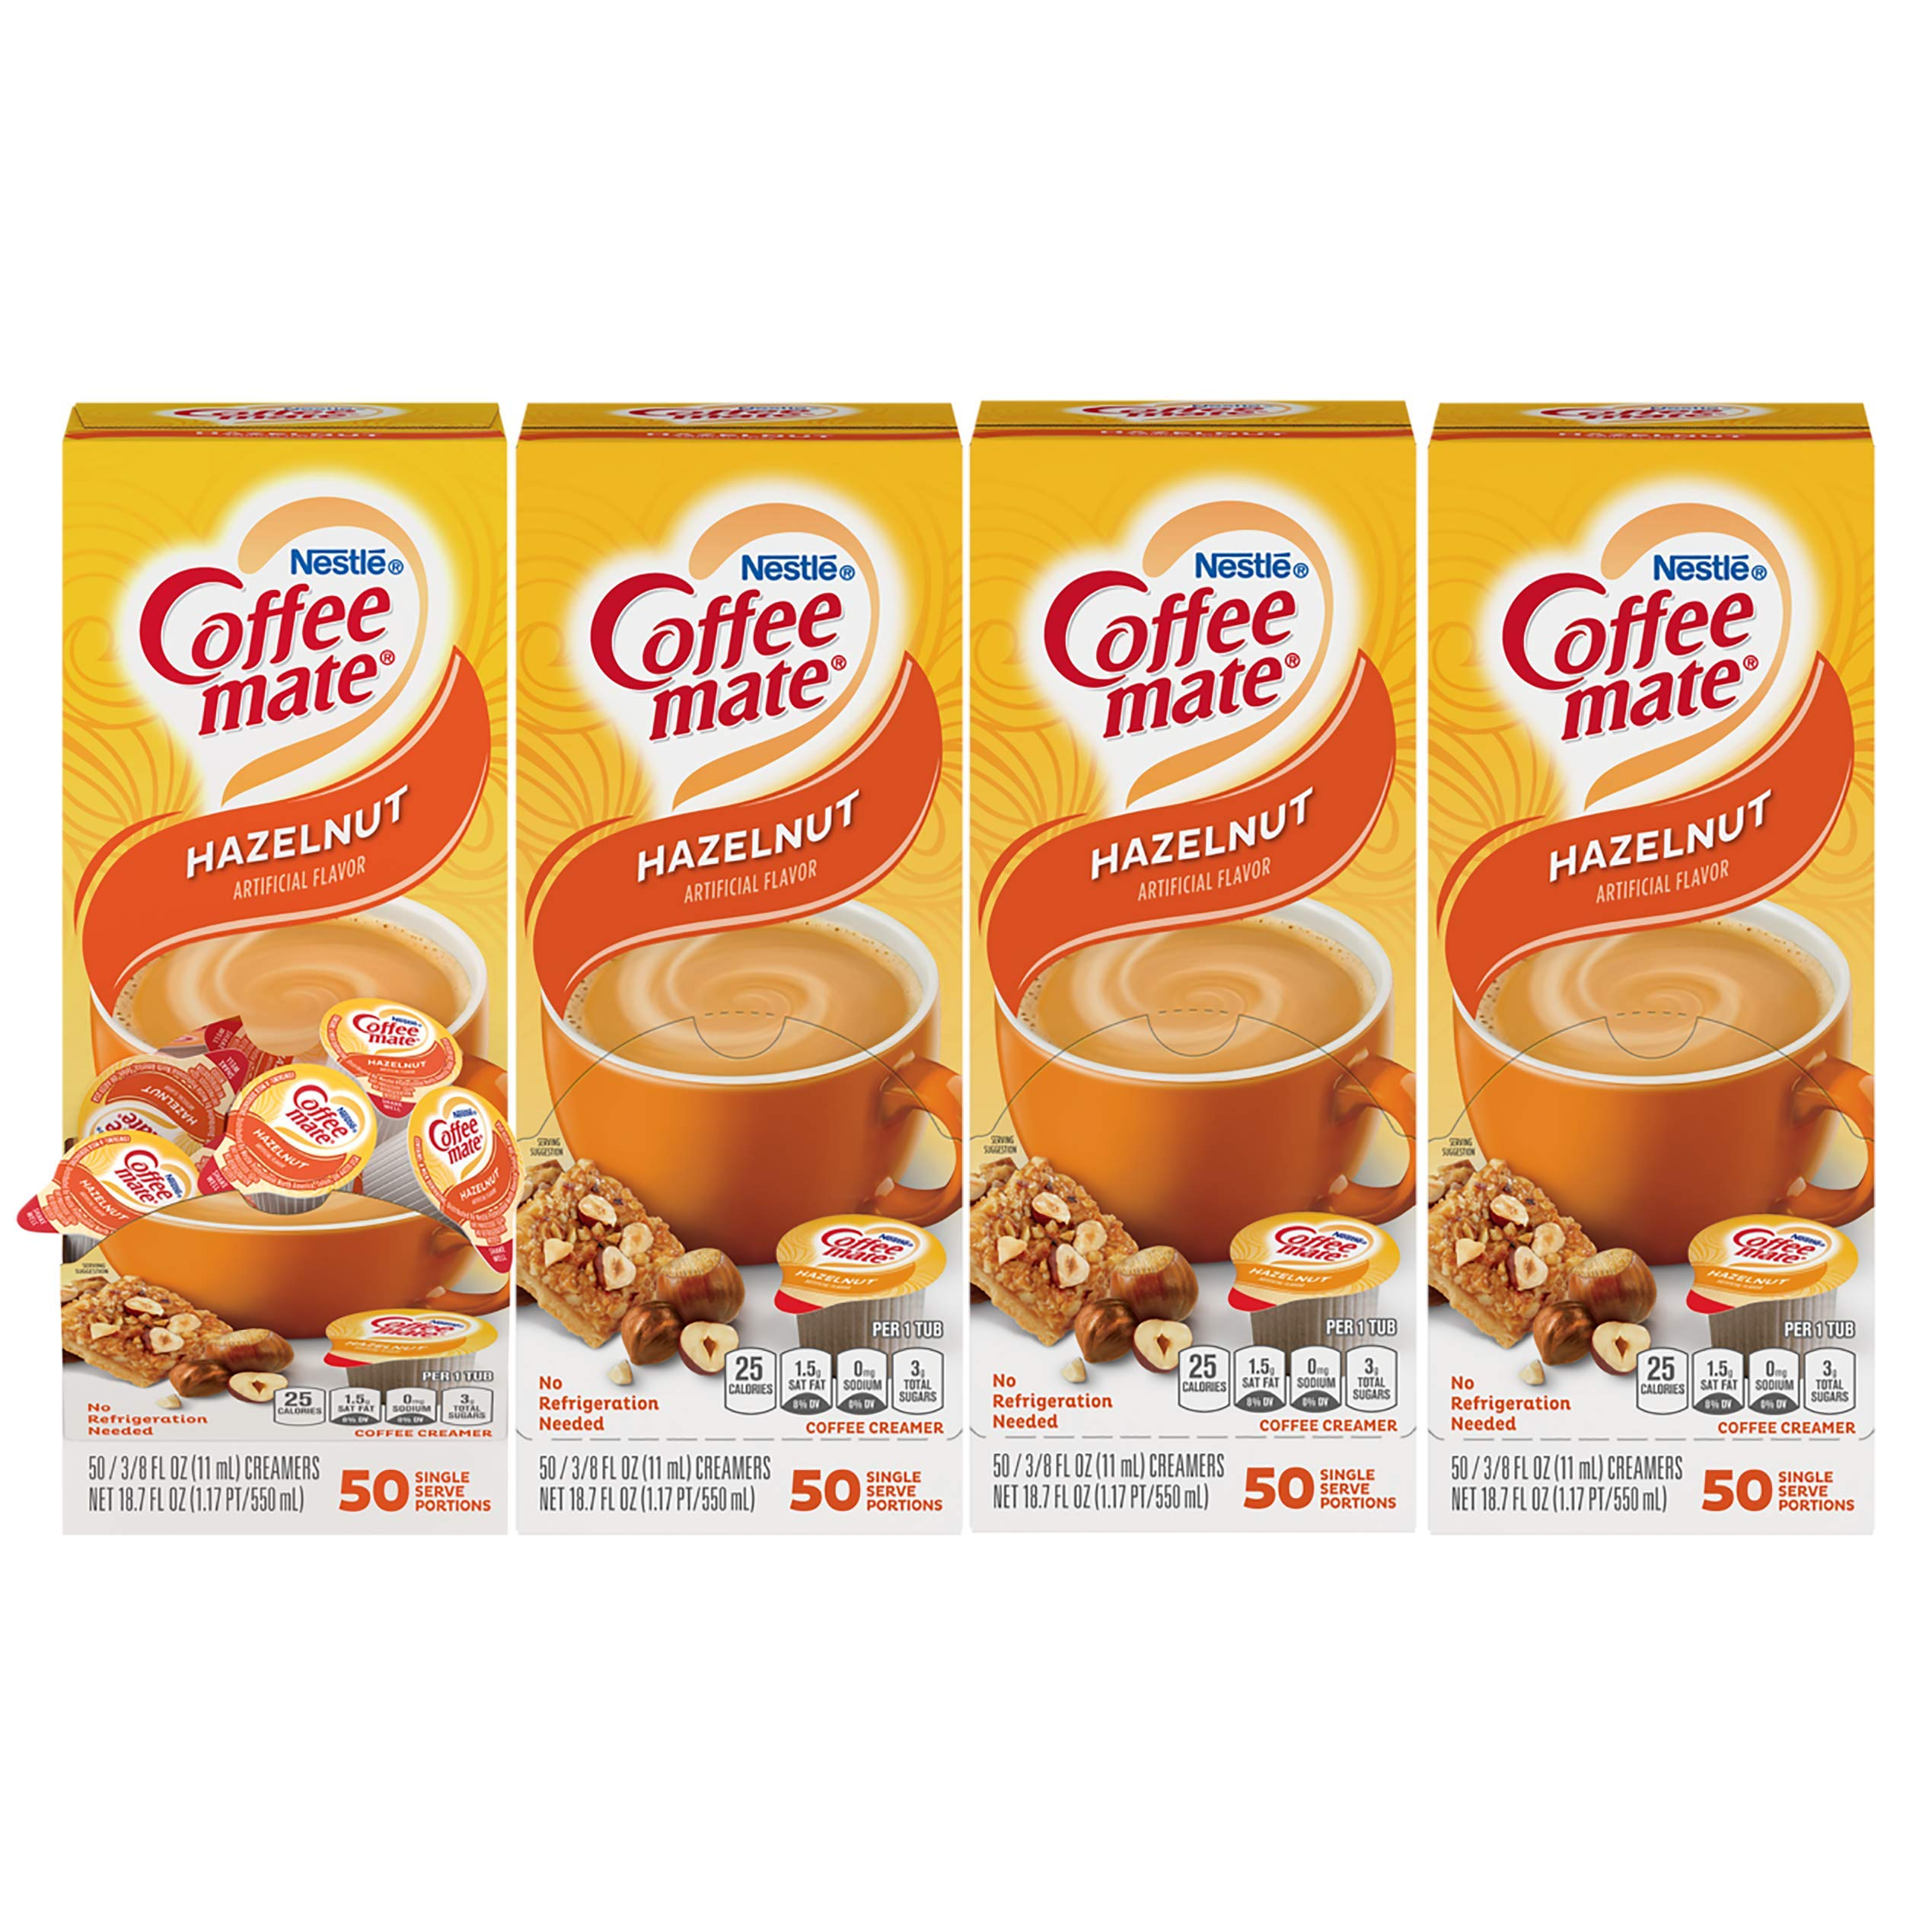 Nestle Coffee mate Coffee Creamer, Hazelnut, Liquid Creamer Singles, Non Dairy, No Refrigeration, Box of 50 Singles (Pack of 4)